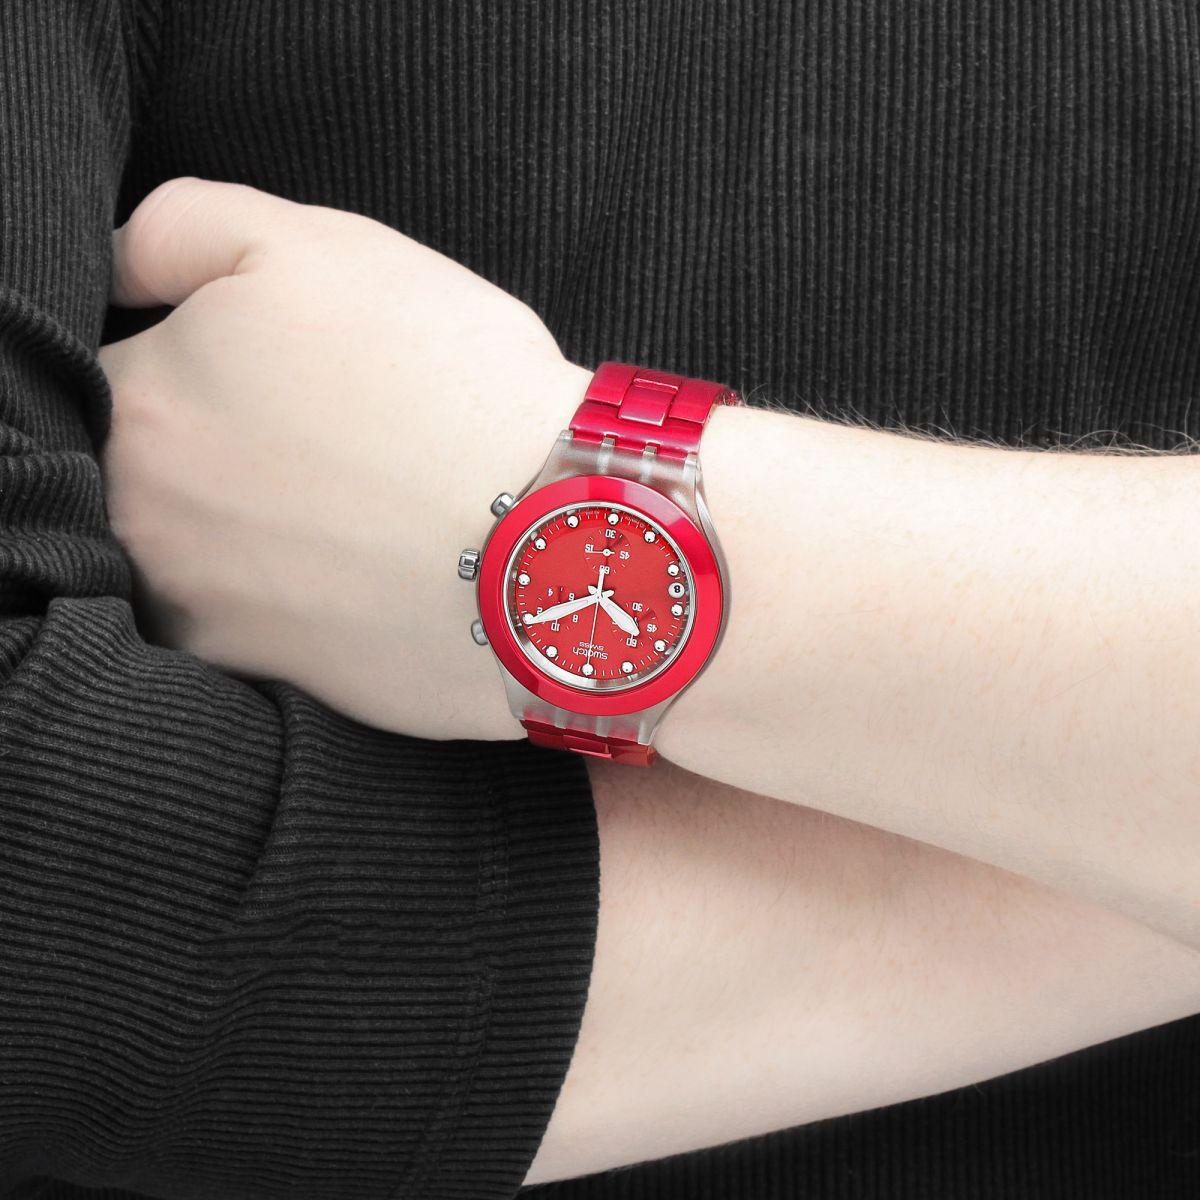 ساعت مچی سواچ قرمز